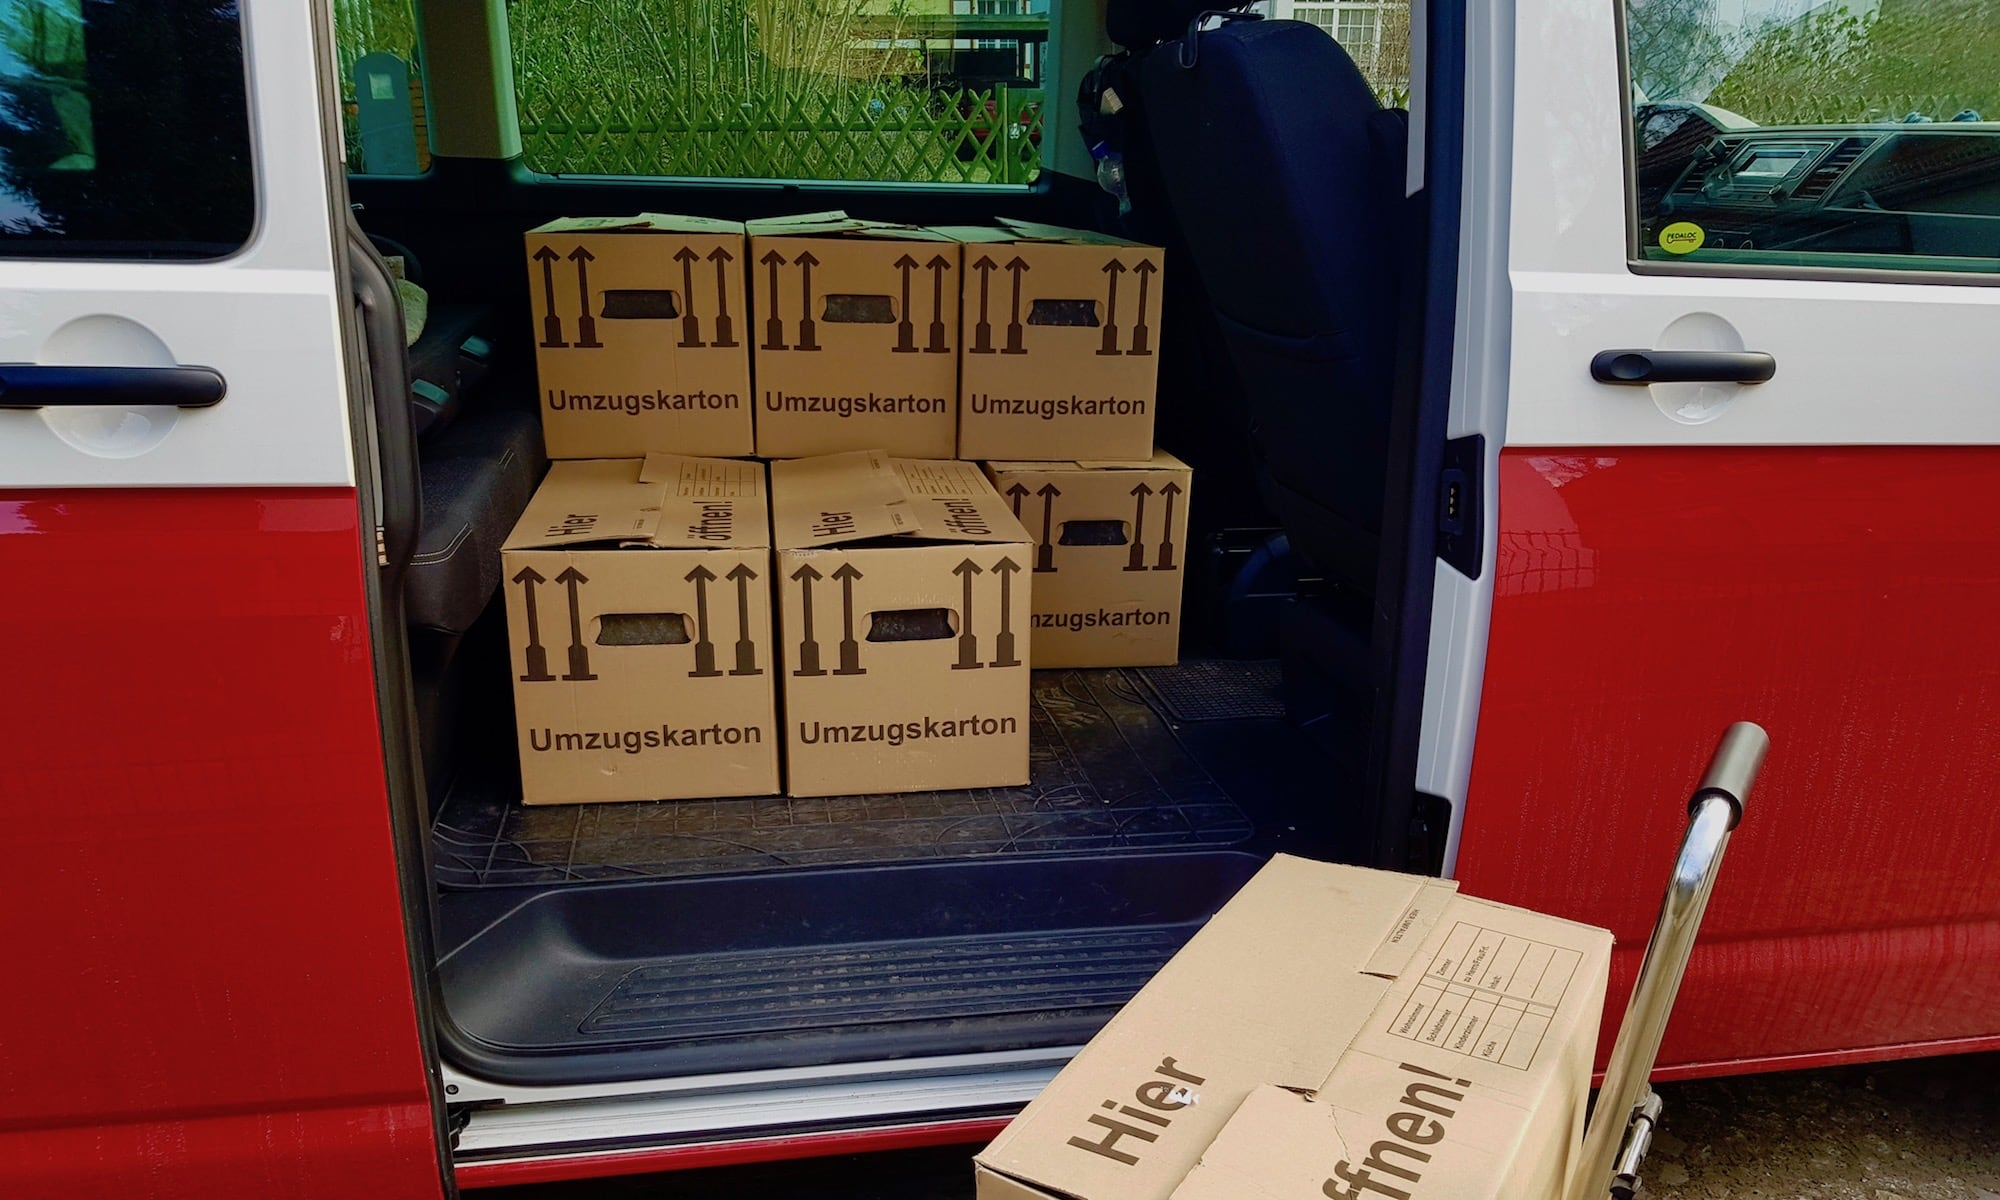 Umzugskartons im Bulli T6 Multivan| Foto: BulliT6.de